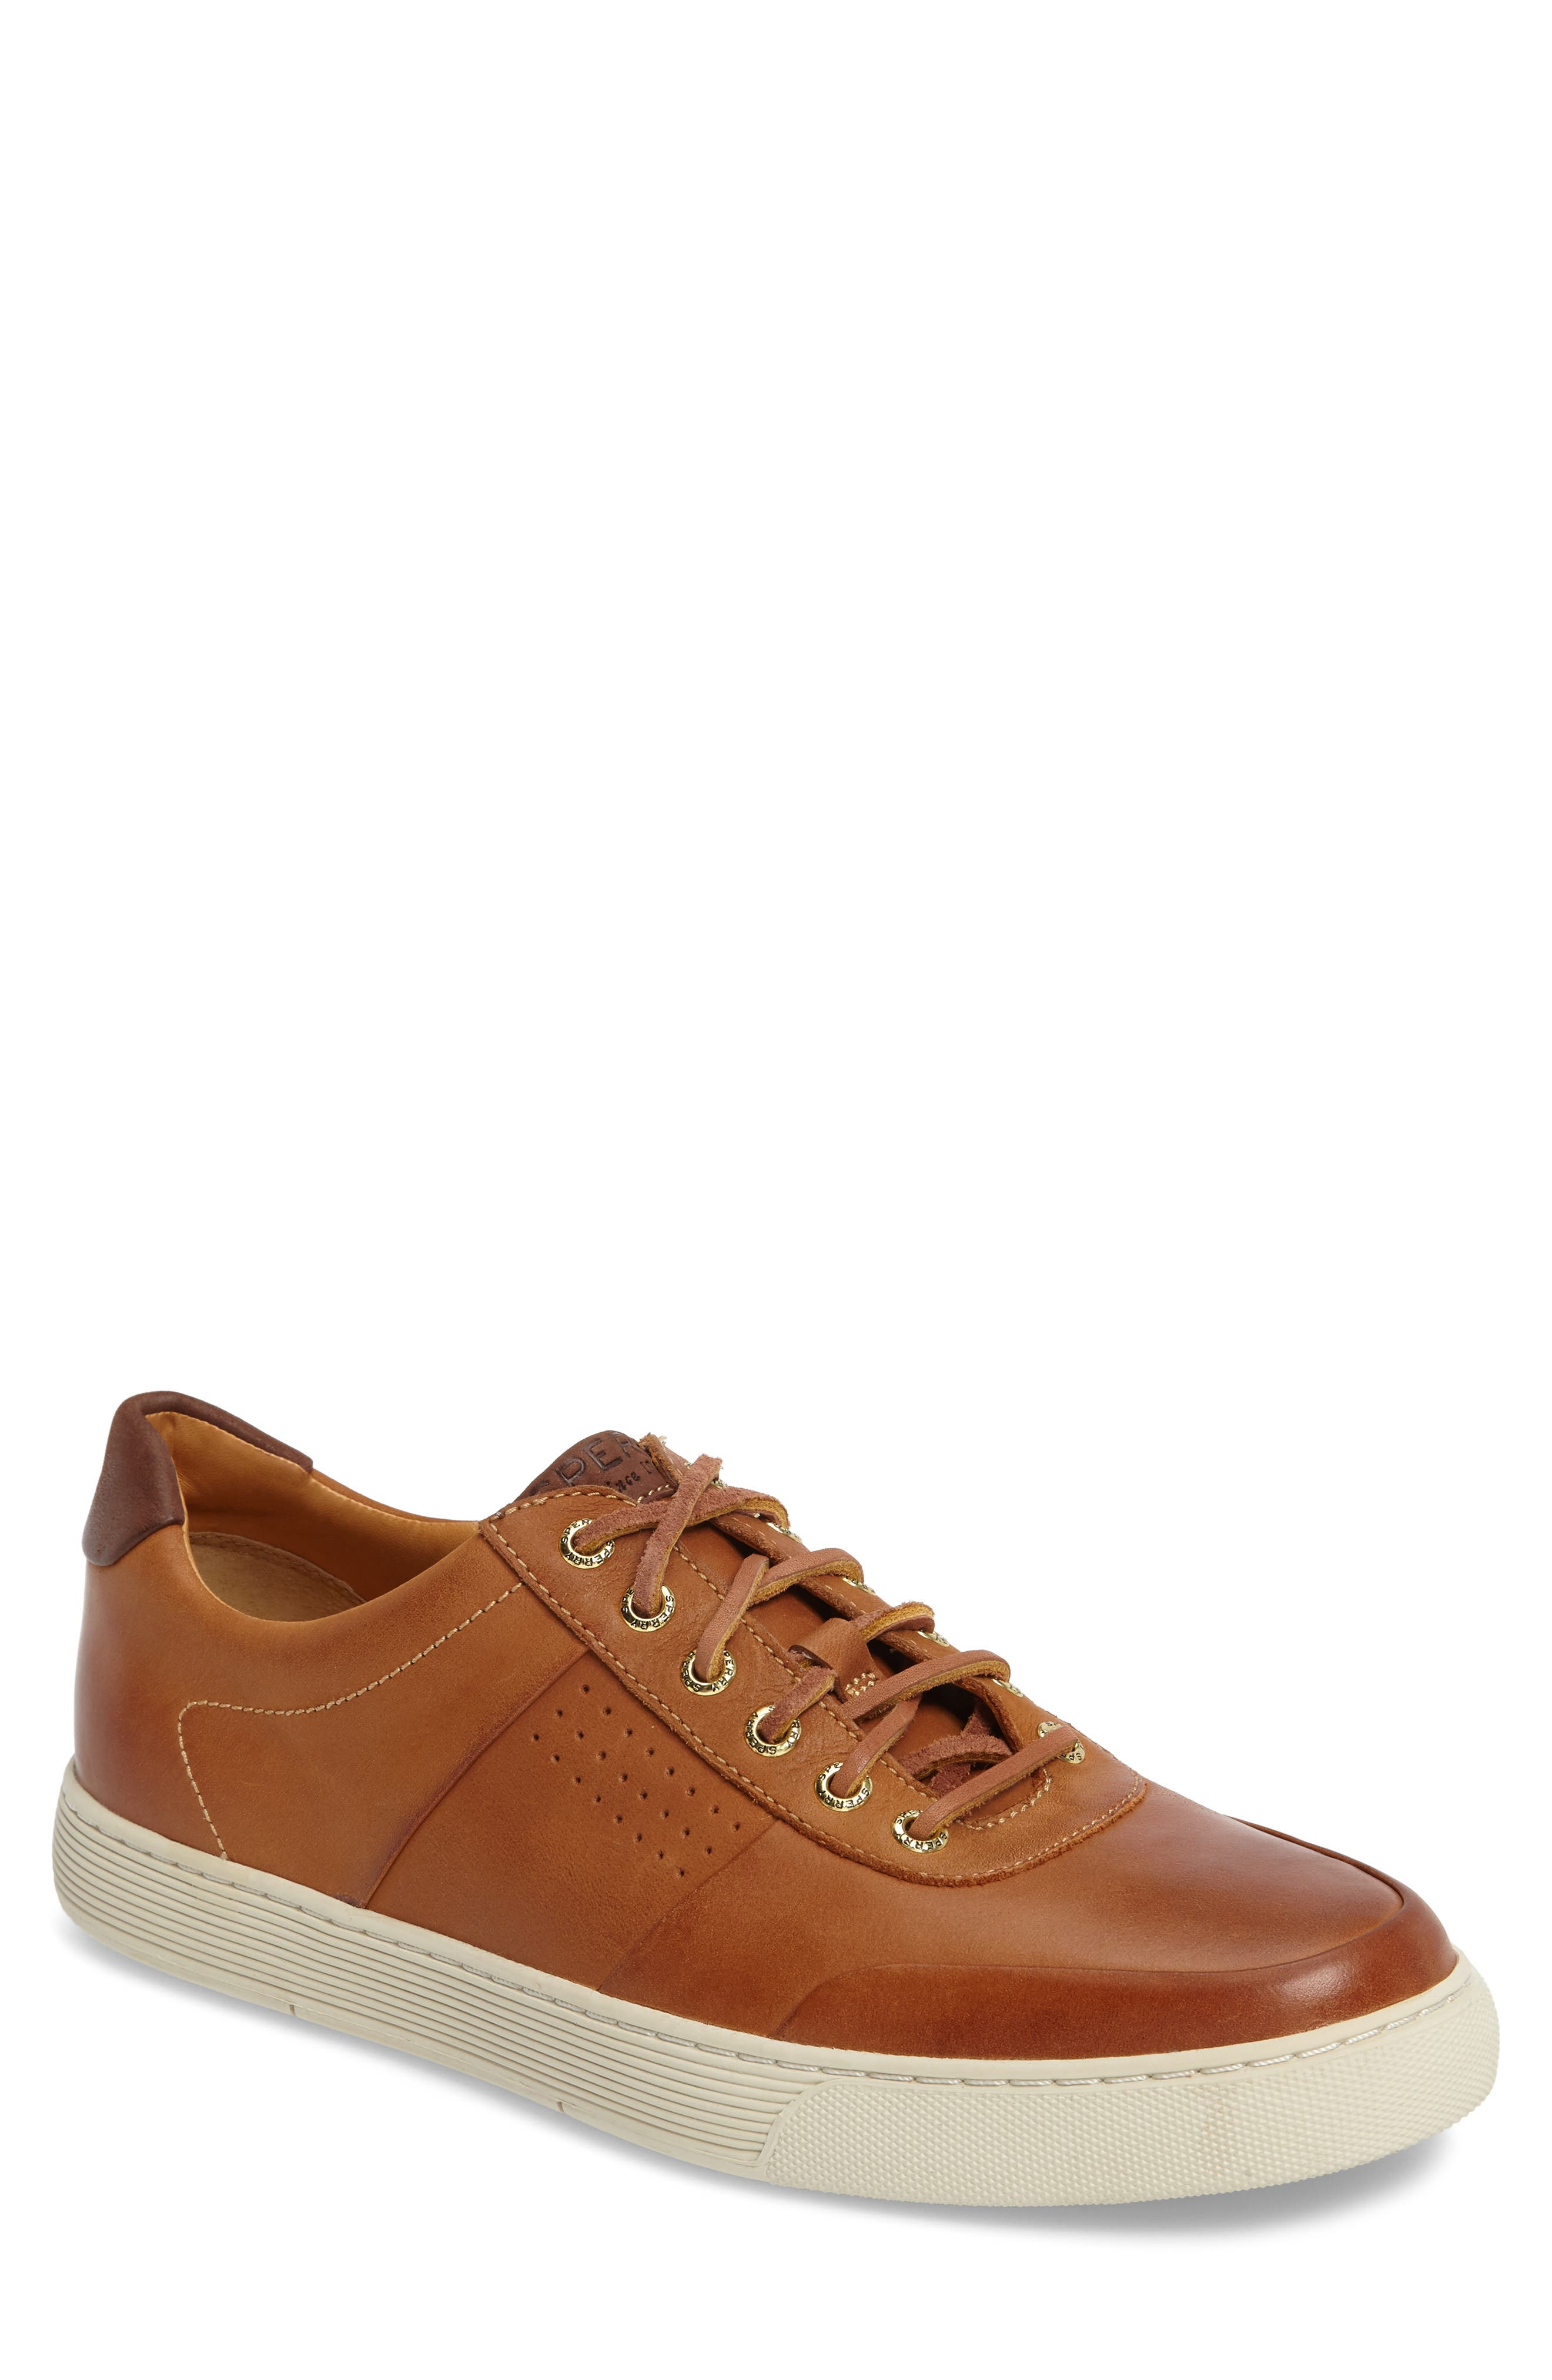 Main Image - Sperry Gold Cup Sport Sneaker (Men)